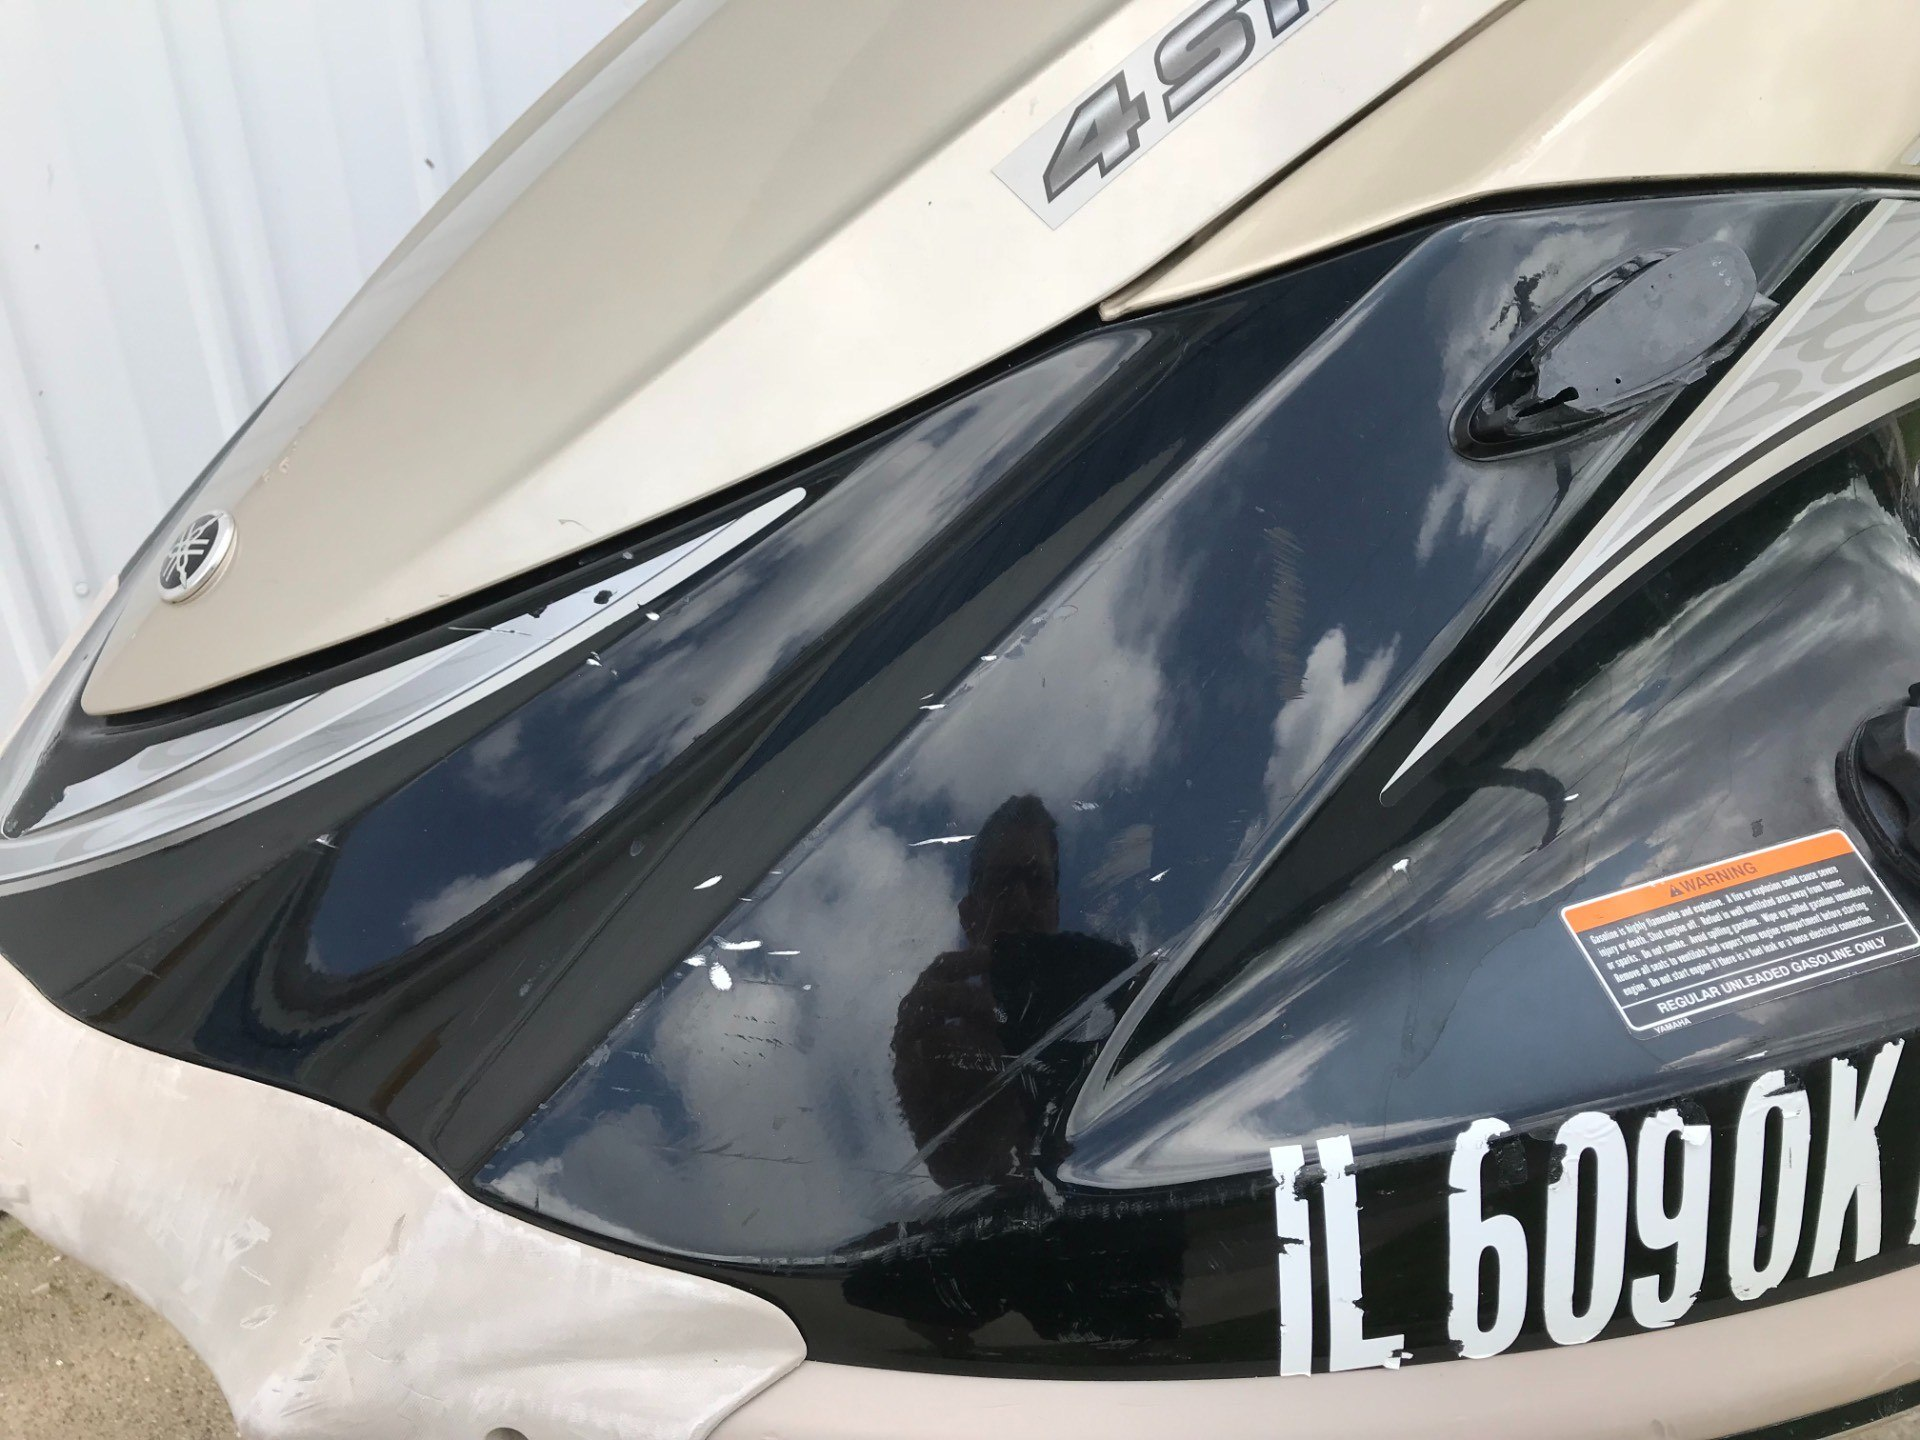 2008 Yamaha VX1100A-GB 12